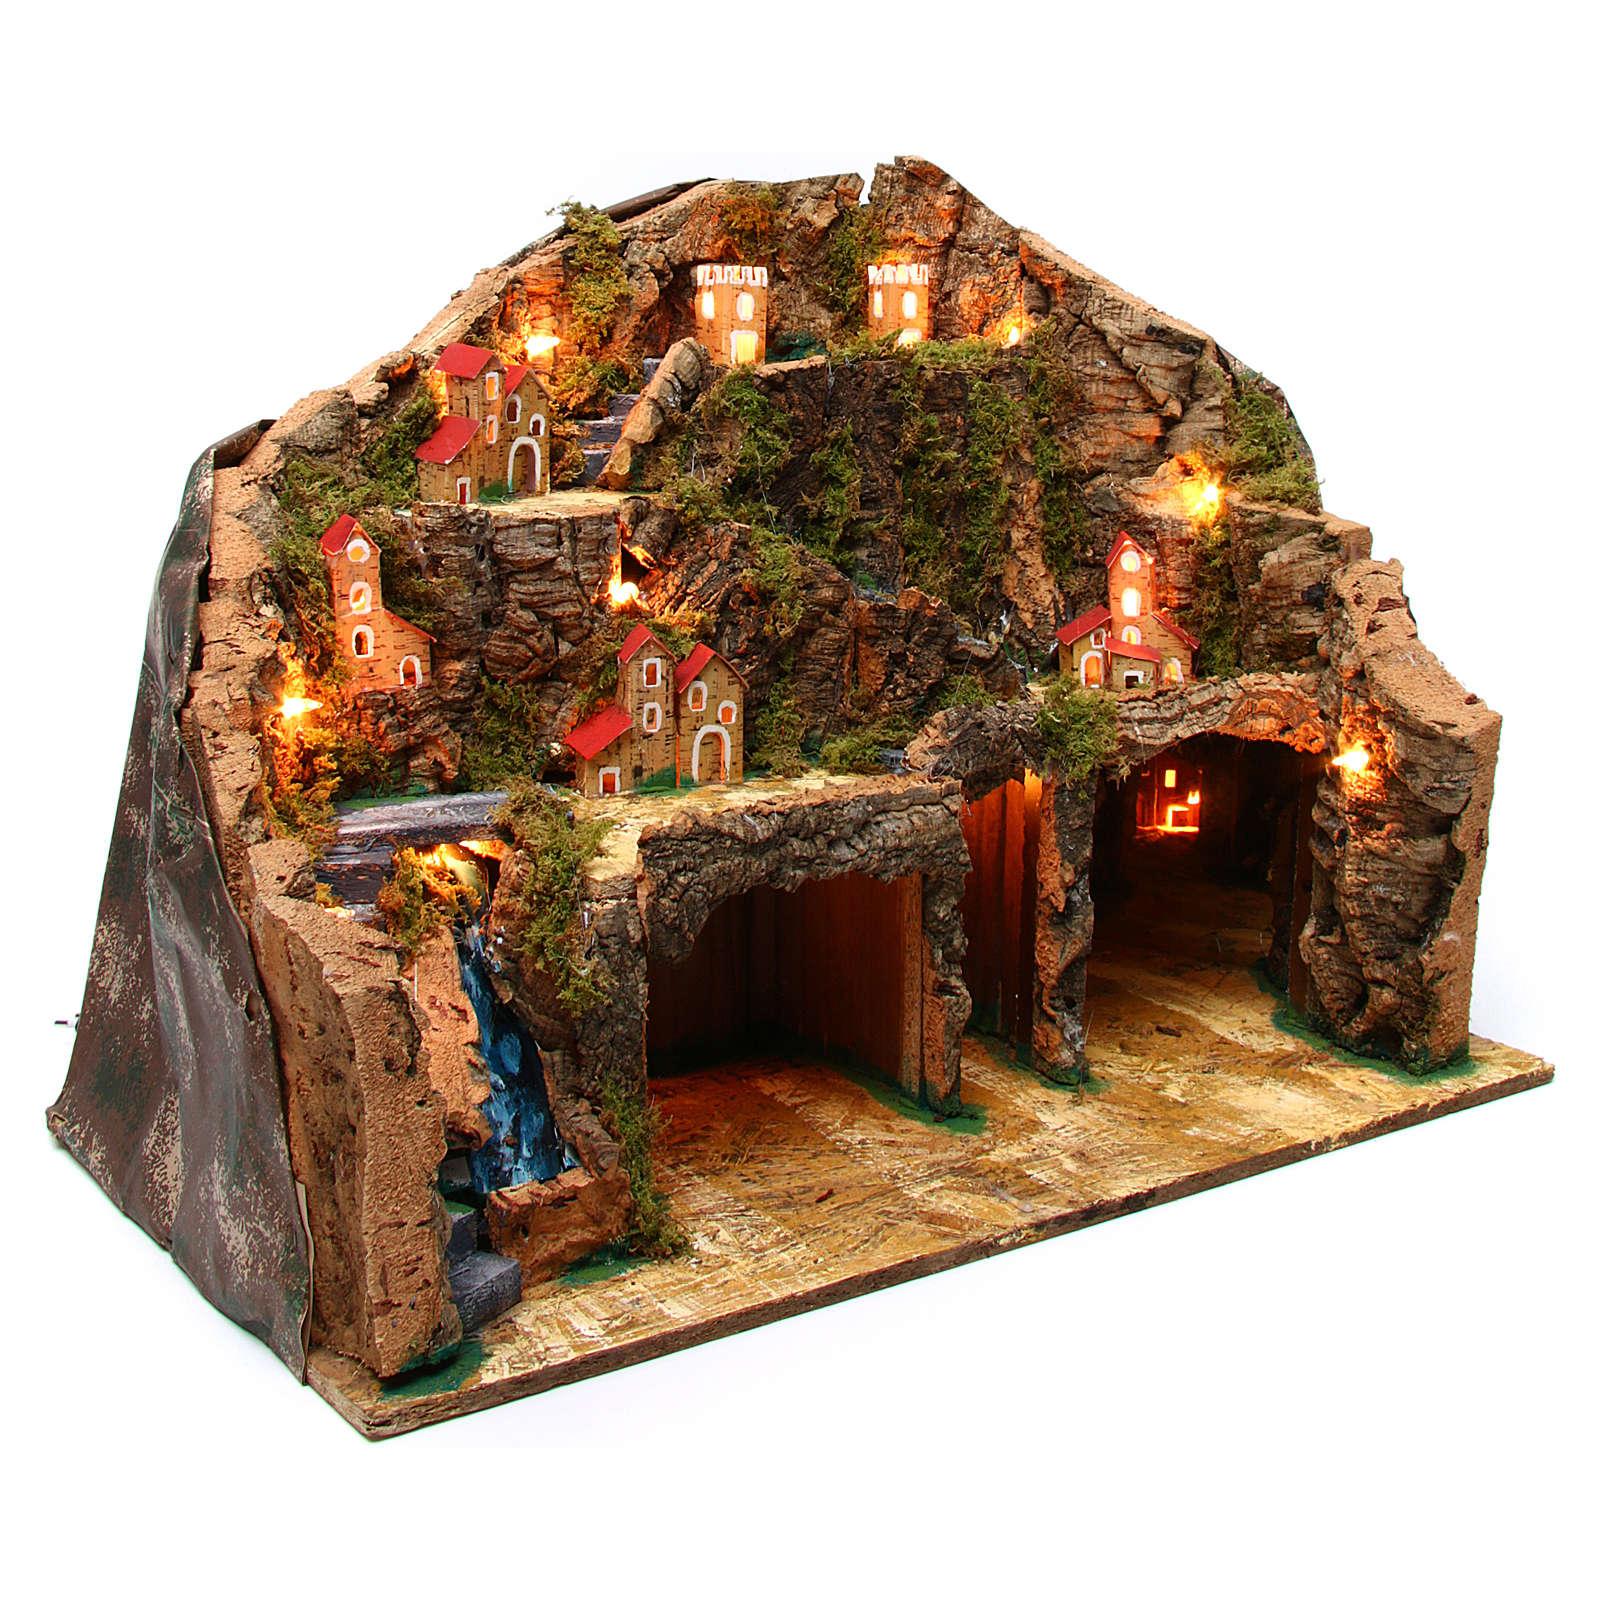 Nativity scene setting Neapolitan village 60x35x40 cm for 10-12 cm characters 4